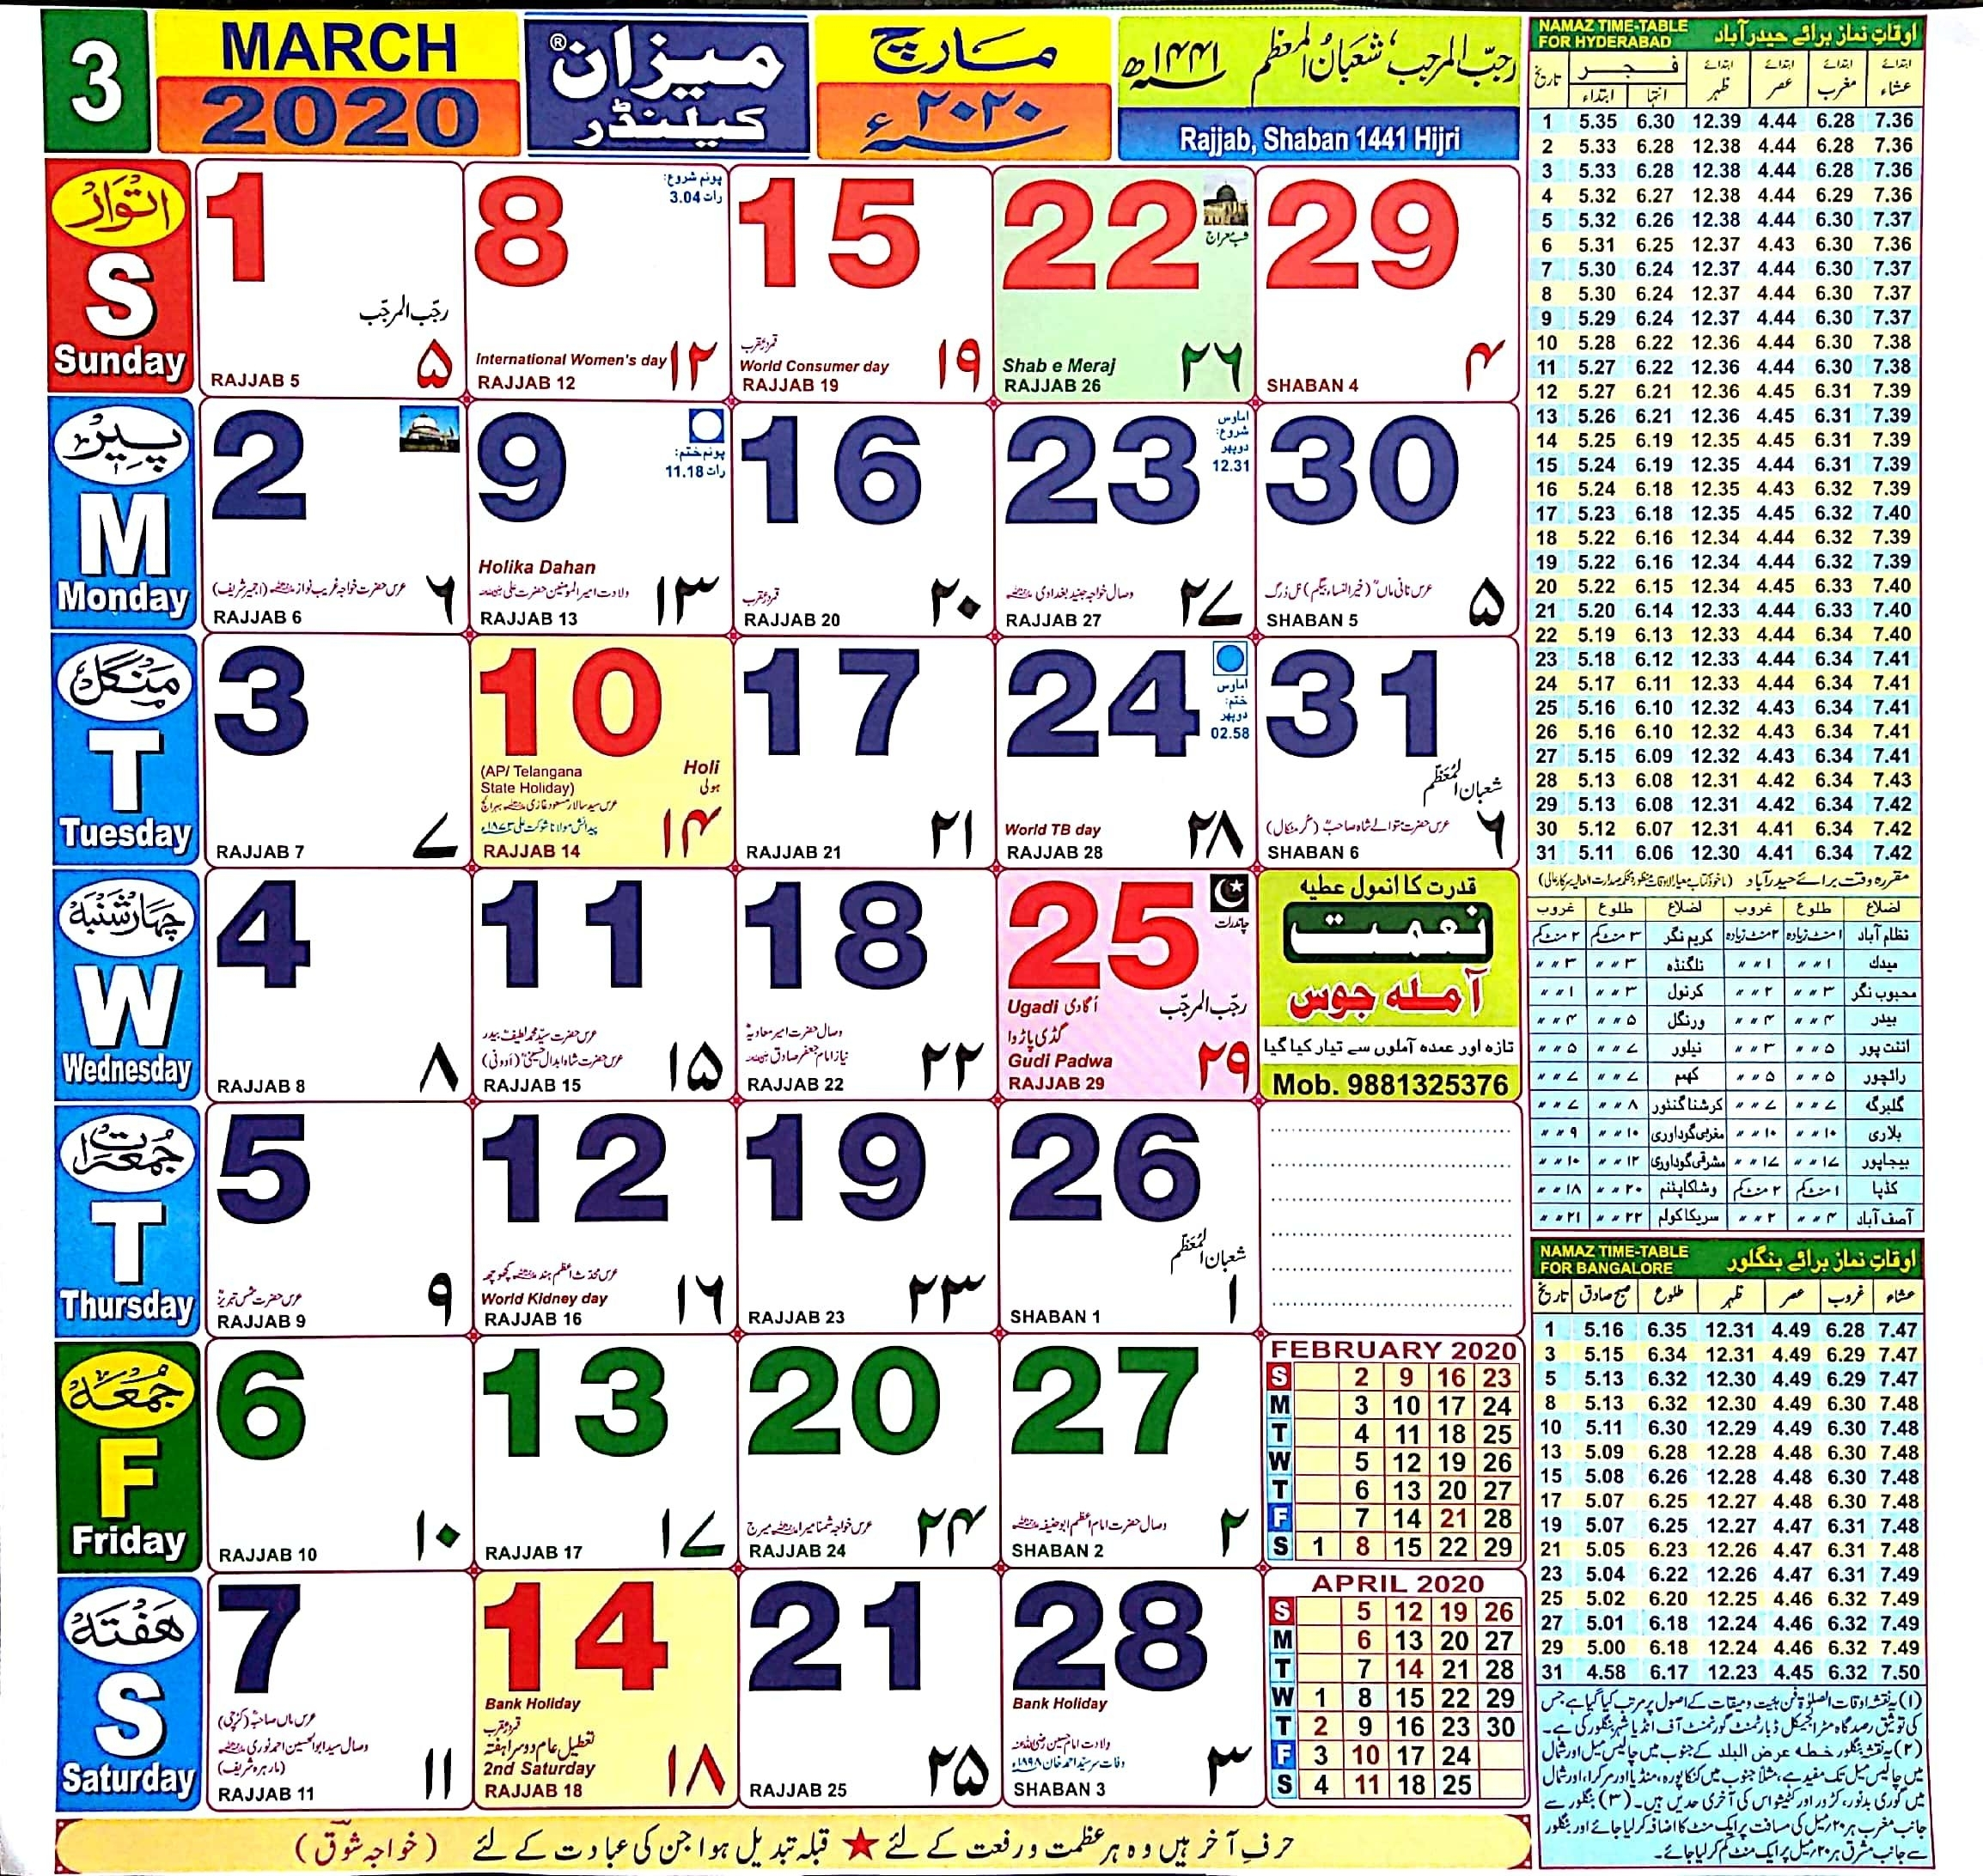 2020 Urdu Calendar Online Free Download | Online Calendar